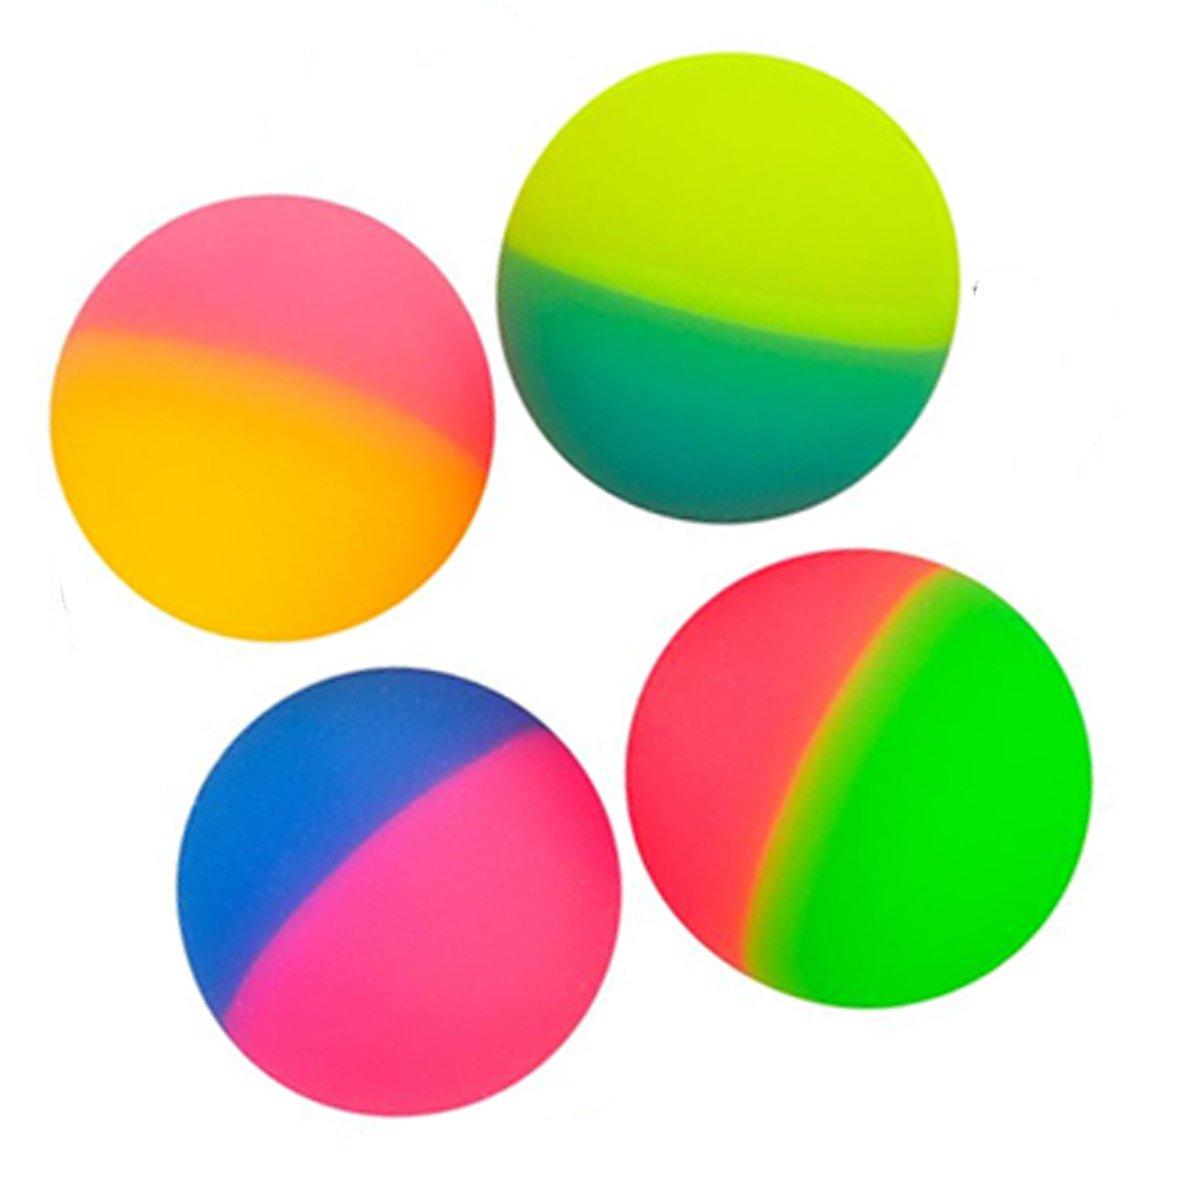 Baskets or Classroom Easter Egg Filler 100 Piece Bulk Easter Themed Party Favor Assortment Bundle for Kids Parties